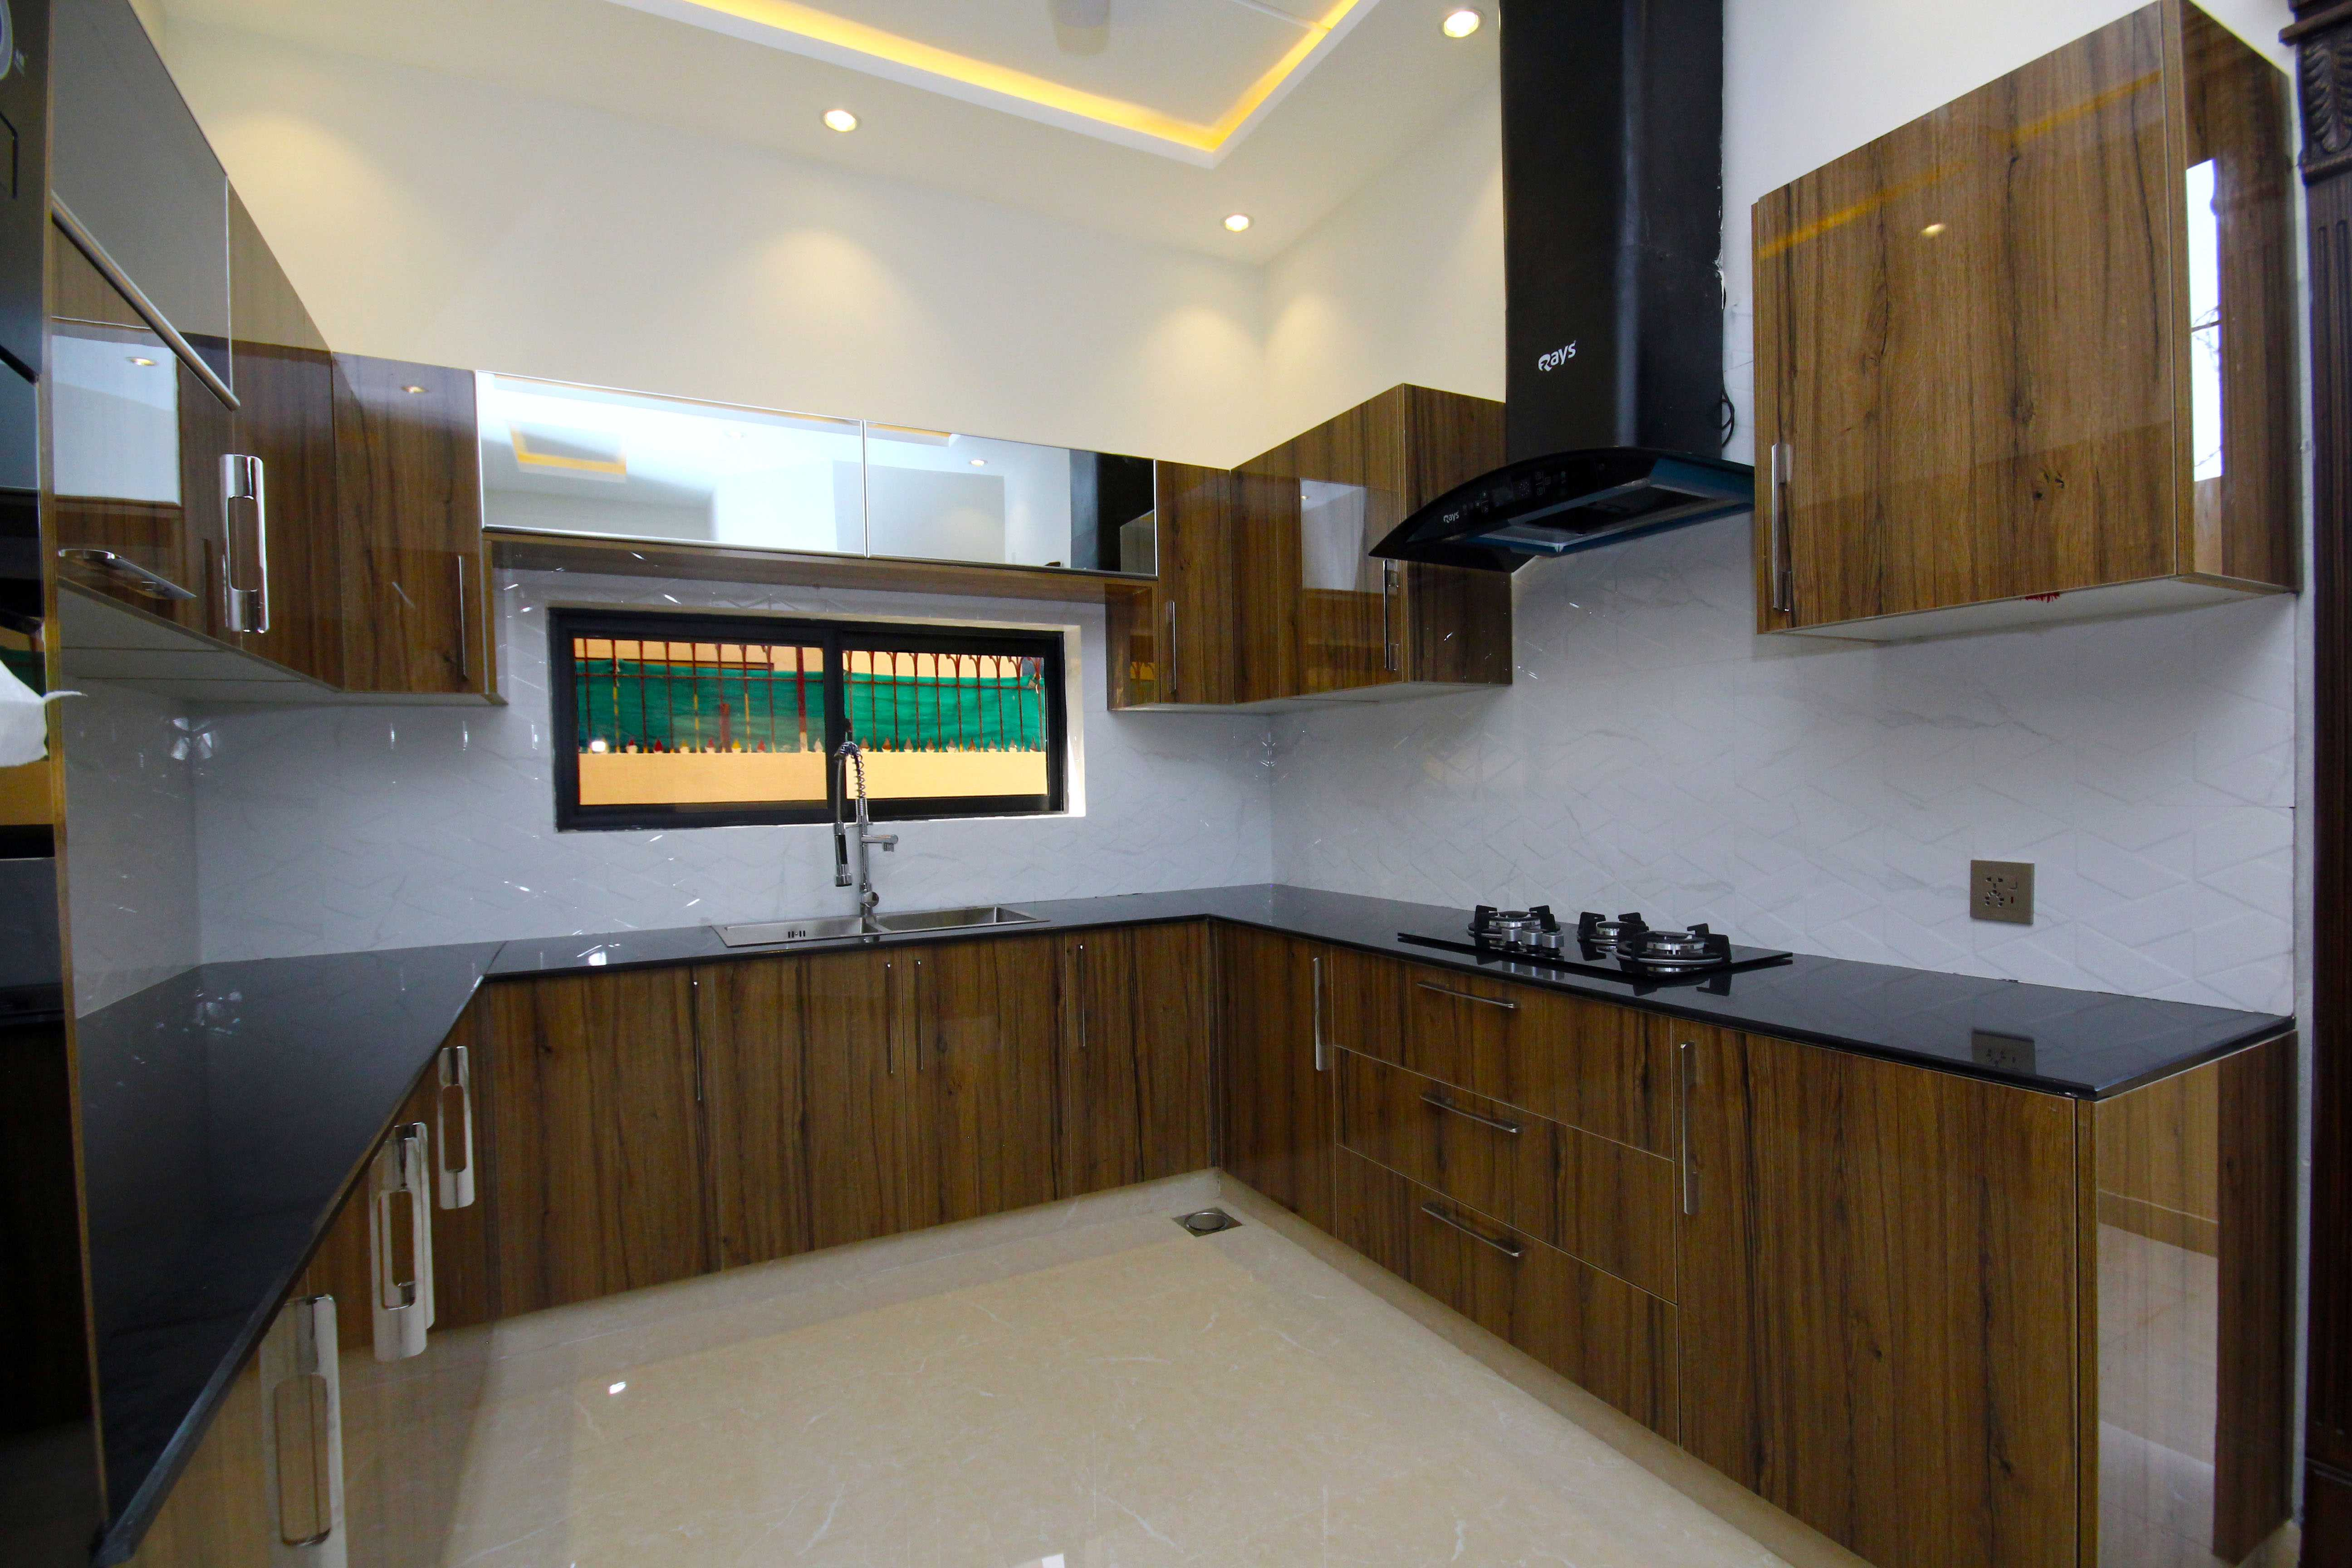 10 Marla Superb Luxurious Bungalow DHA